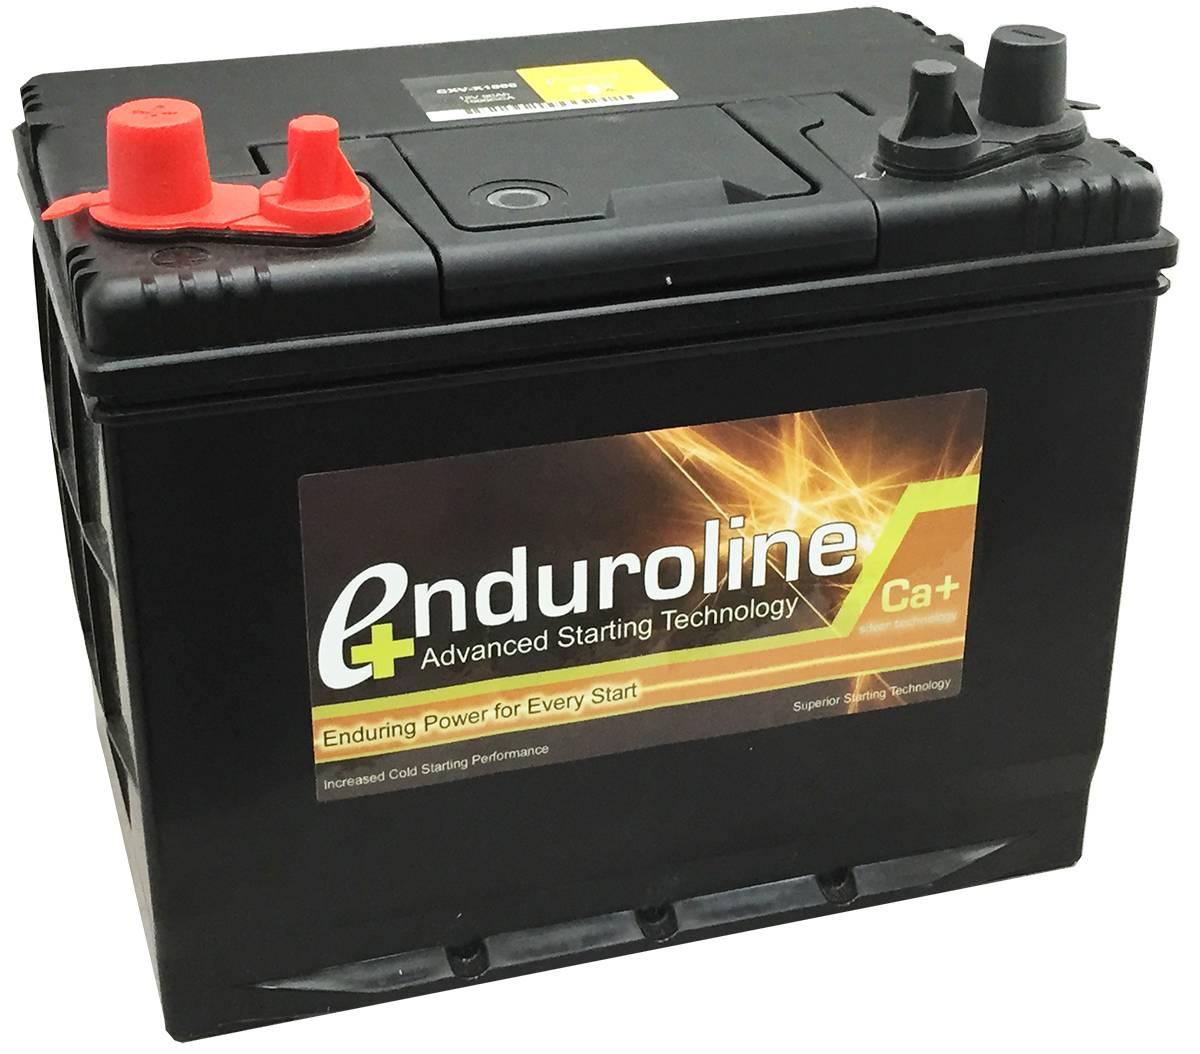 enduroline cxv x 1000 amp car batteries enduroline car batteries. Black Bedroom Furniture Sets. Home Design Ideas